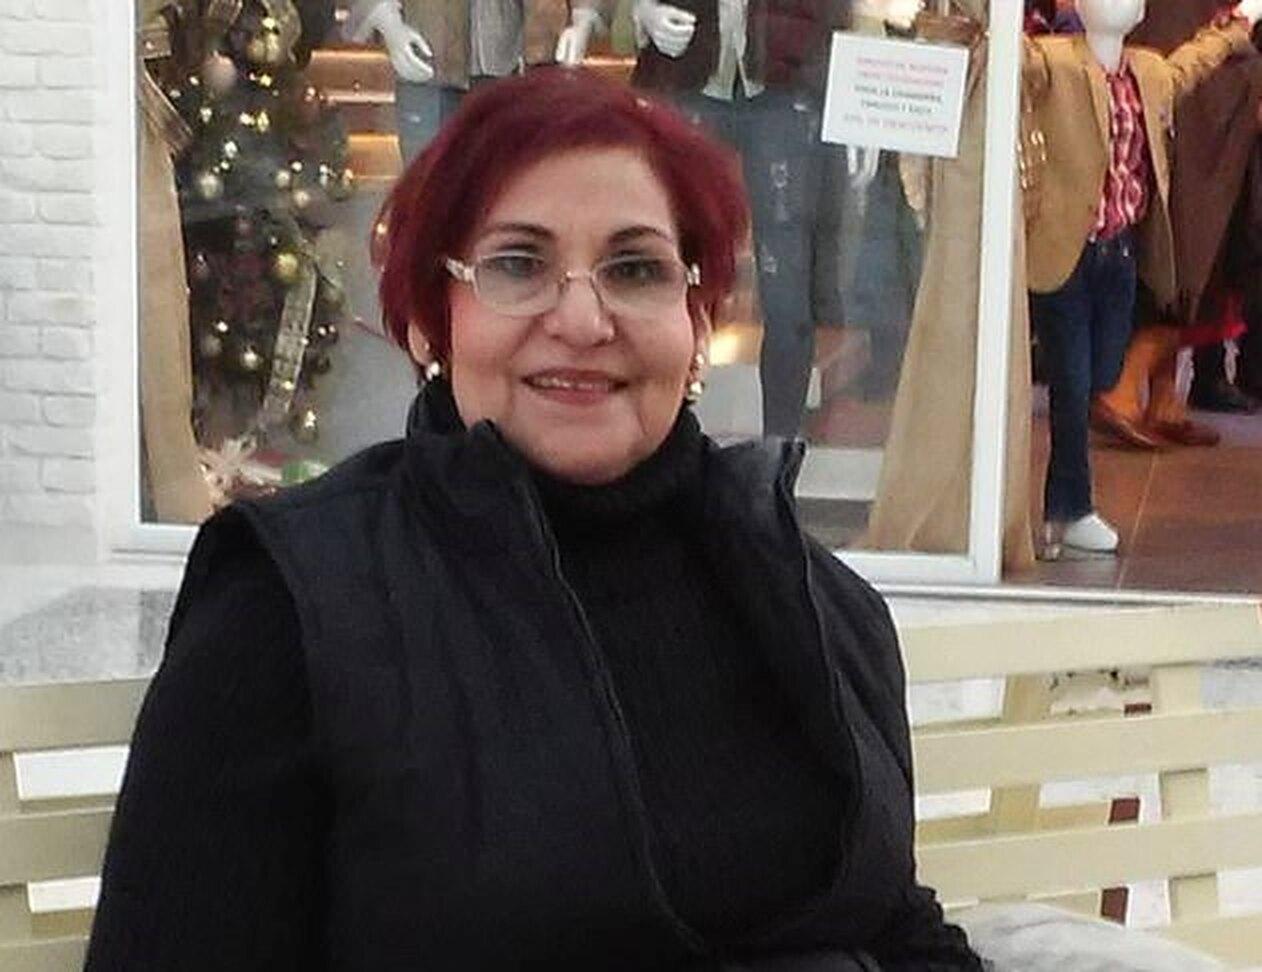 Мириам Мартинес Родригес